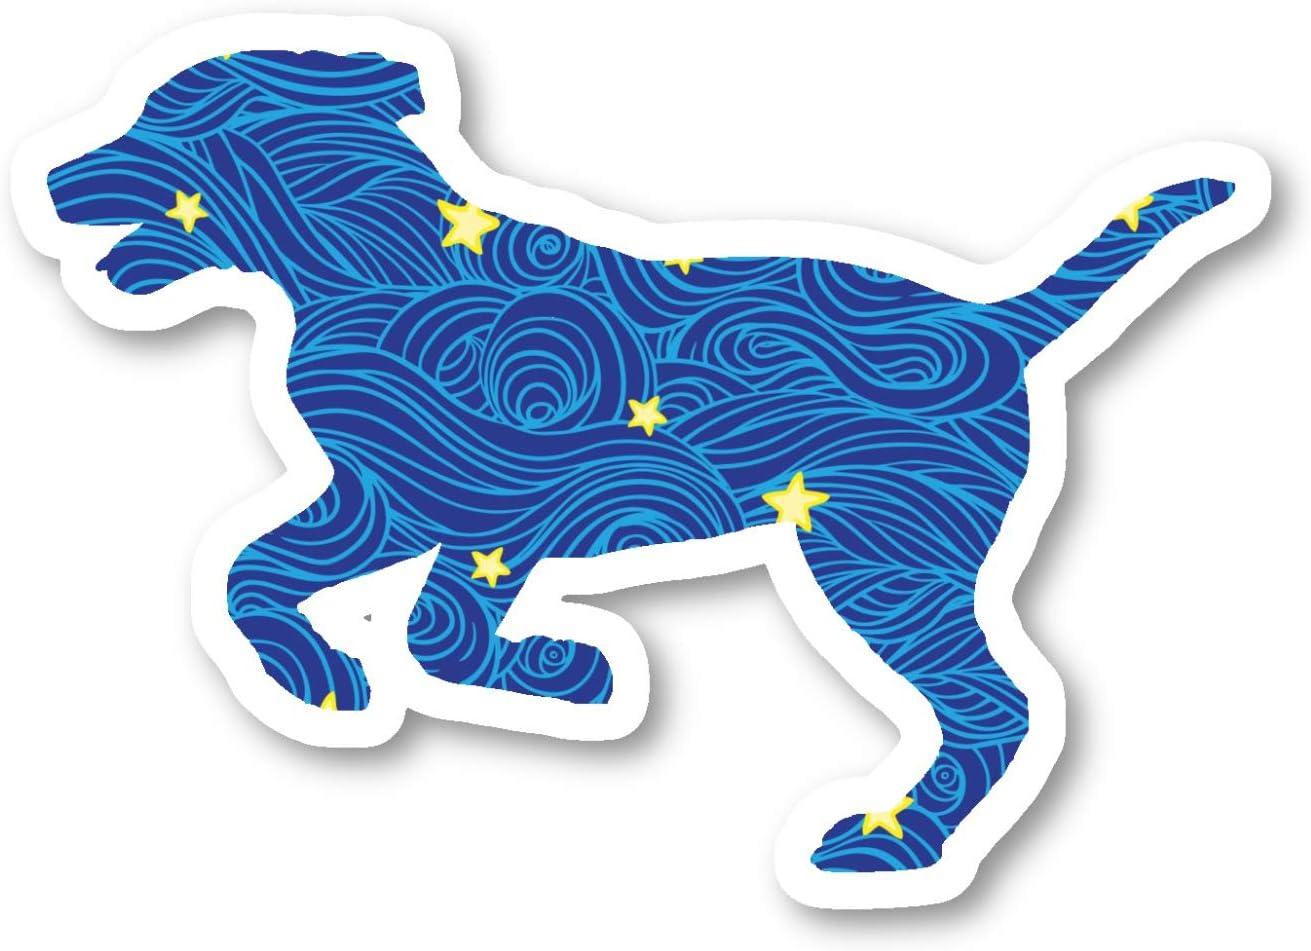 Dog Running Sticker Blue Spirals and Stars Stickers - 2 Pack - Laptop Stickers - 2.5